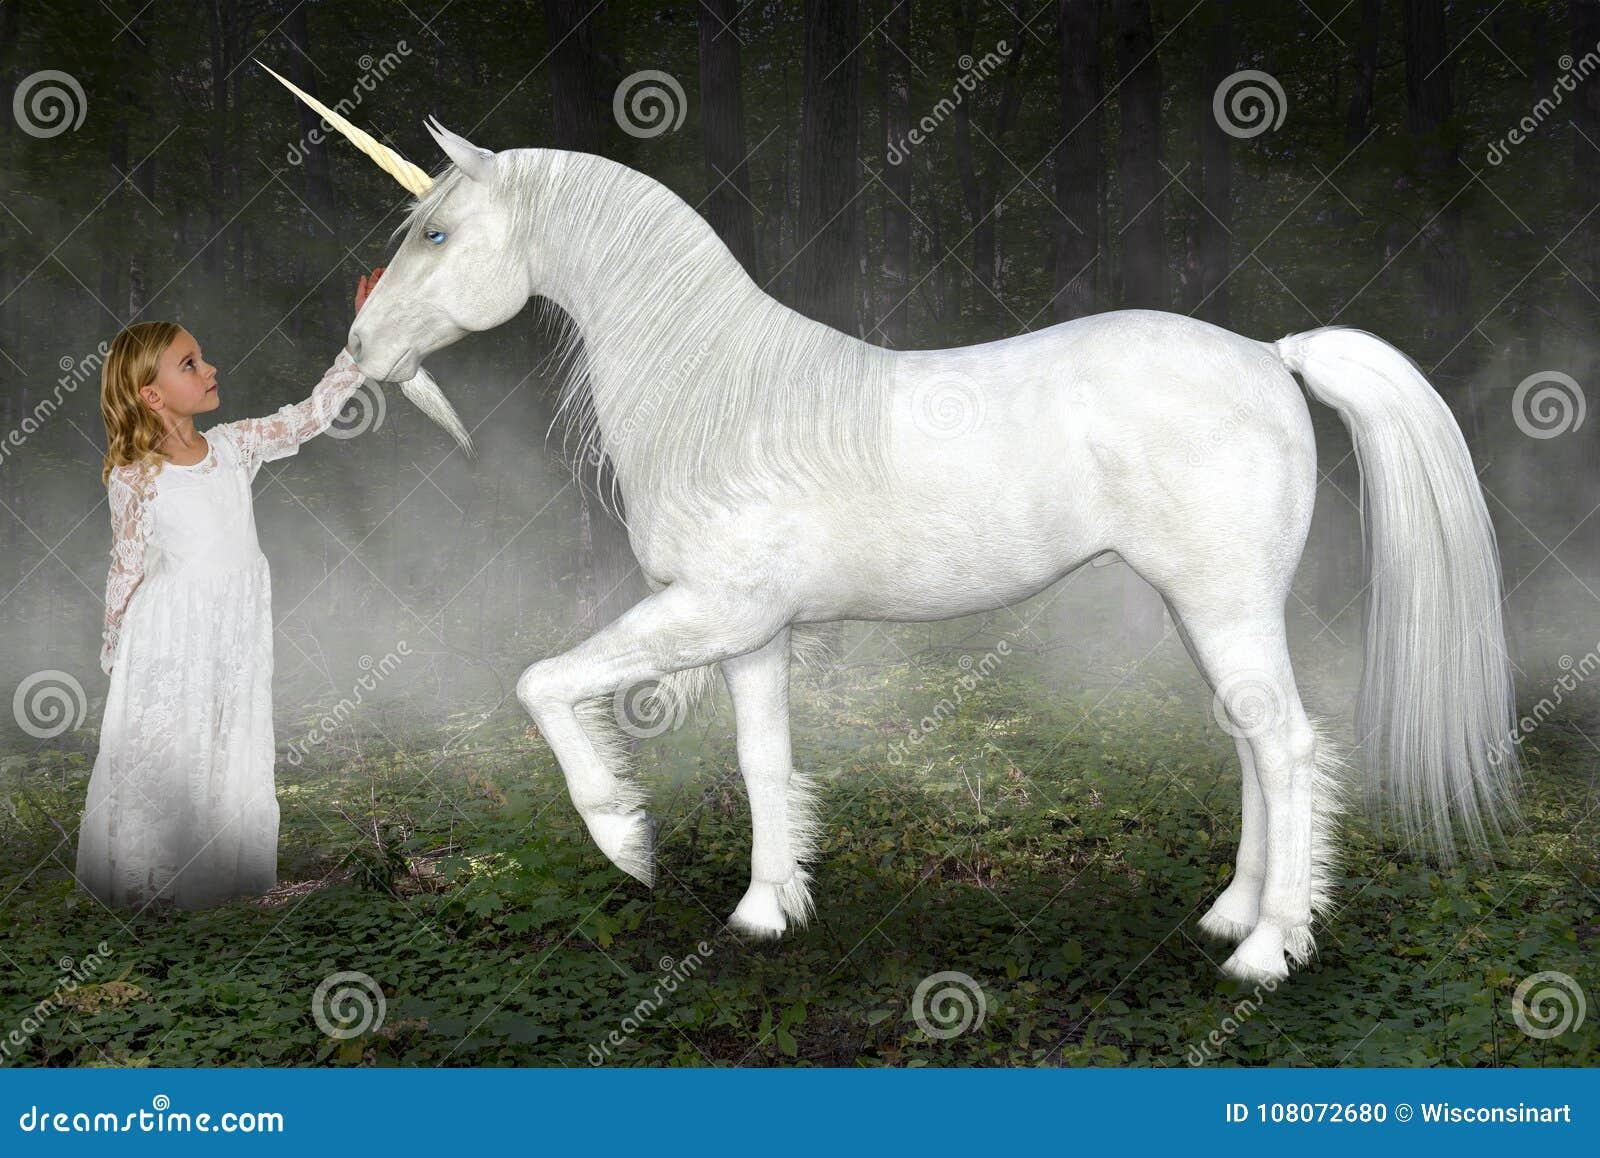 Jeune fille, licorne, nature, espoir, amour, paix